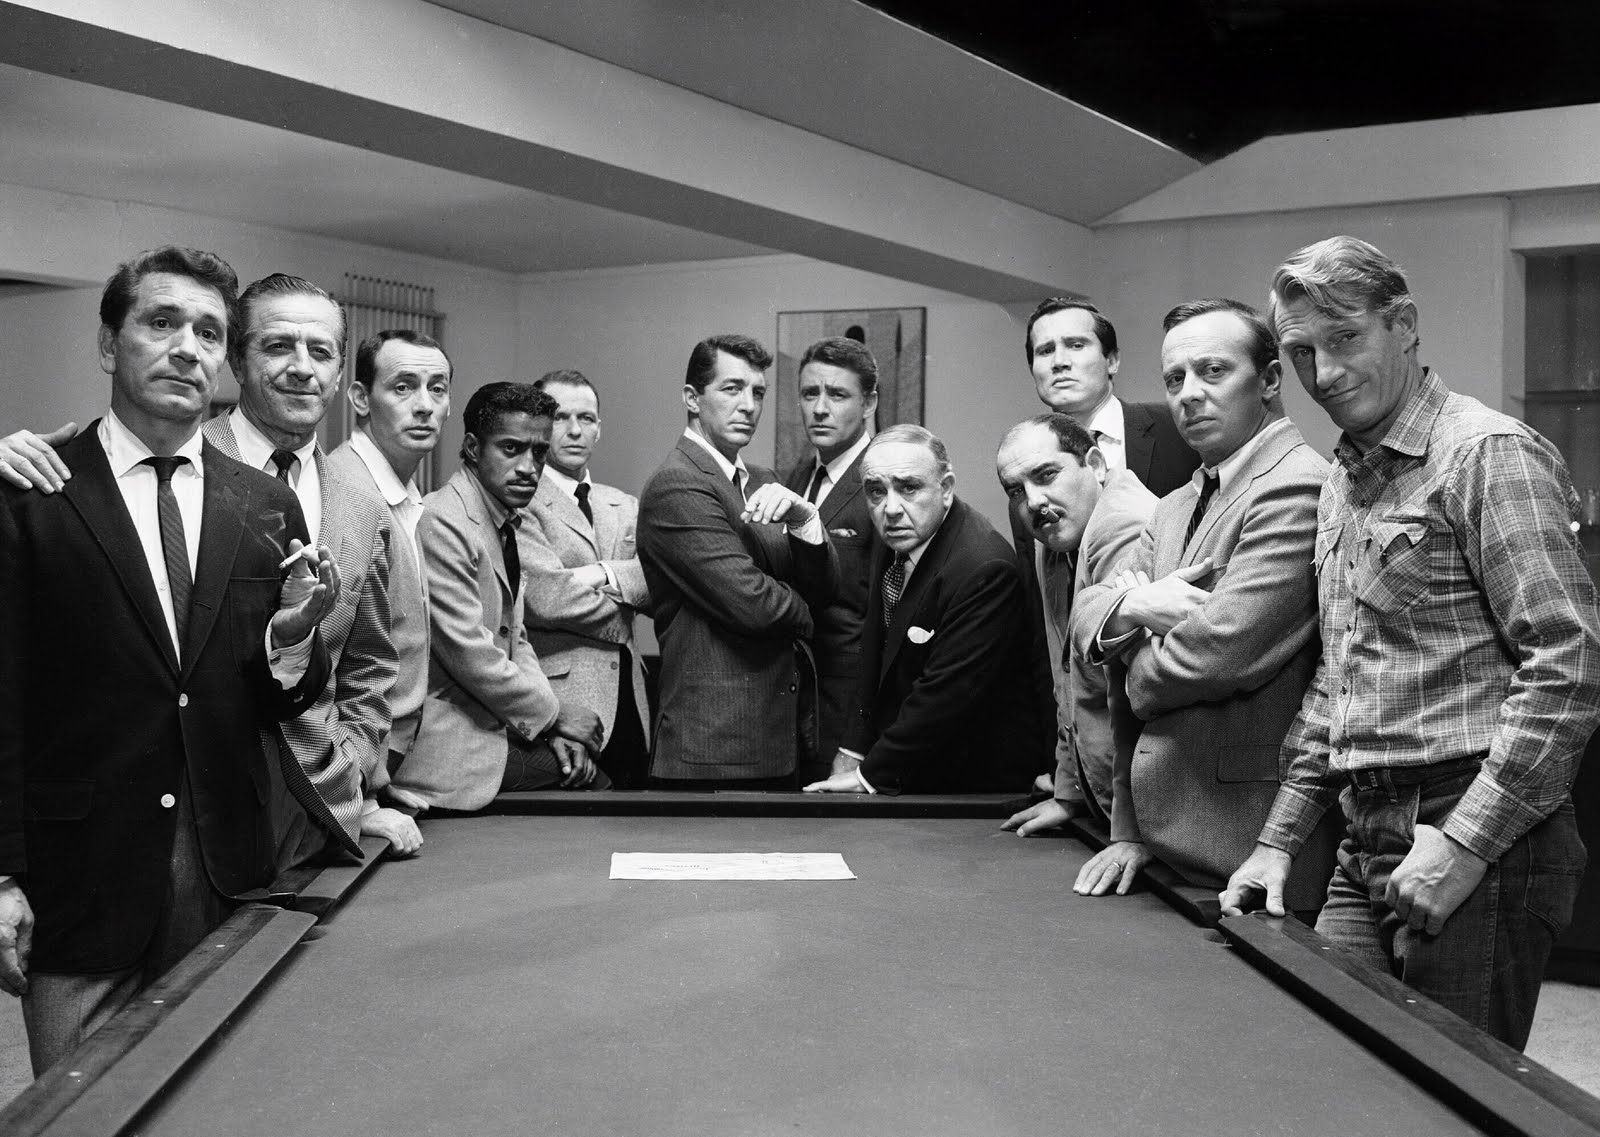 Oceans 11 casinos gambling commission online returns